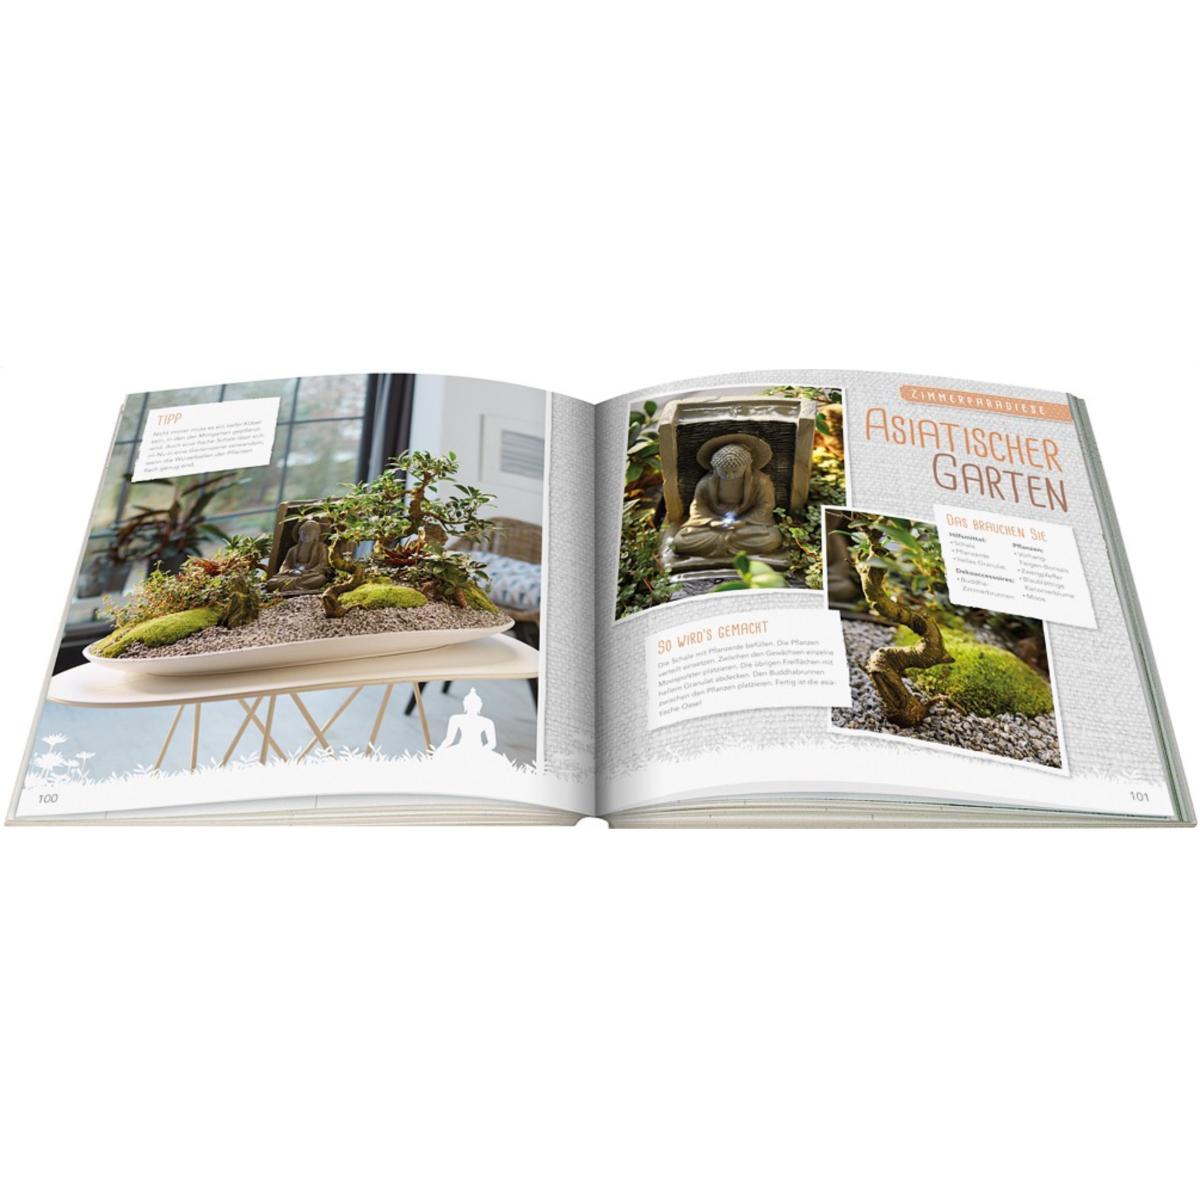 mini garten shop xxs gardening buch. Black Bedroom Furniture Sets. Home Design Ideas